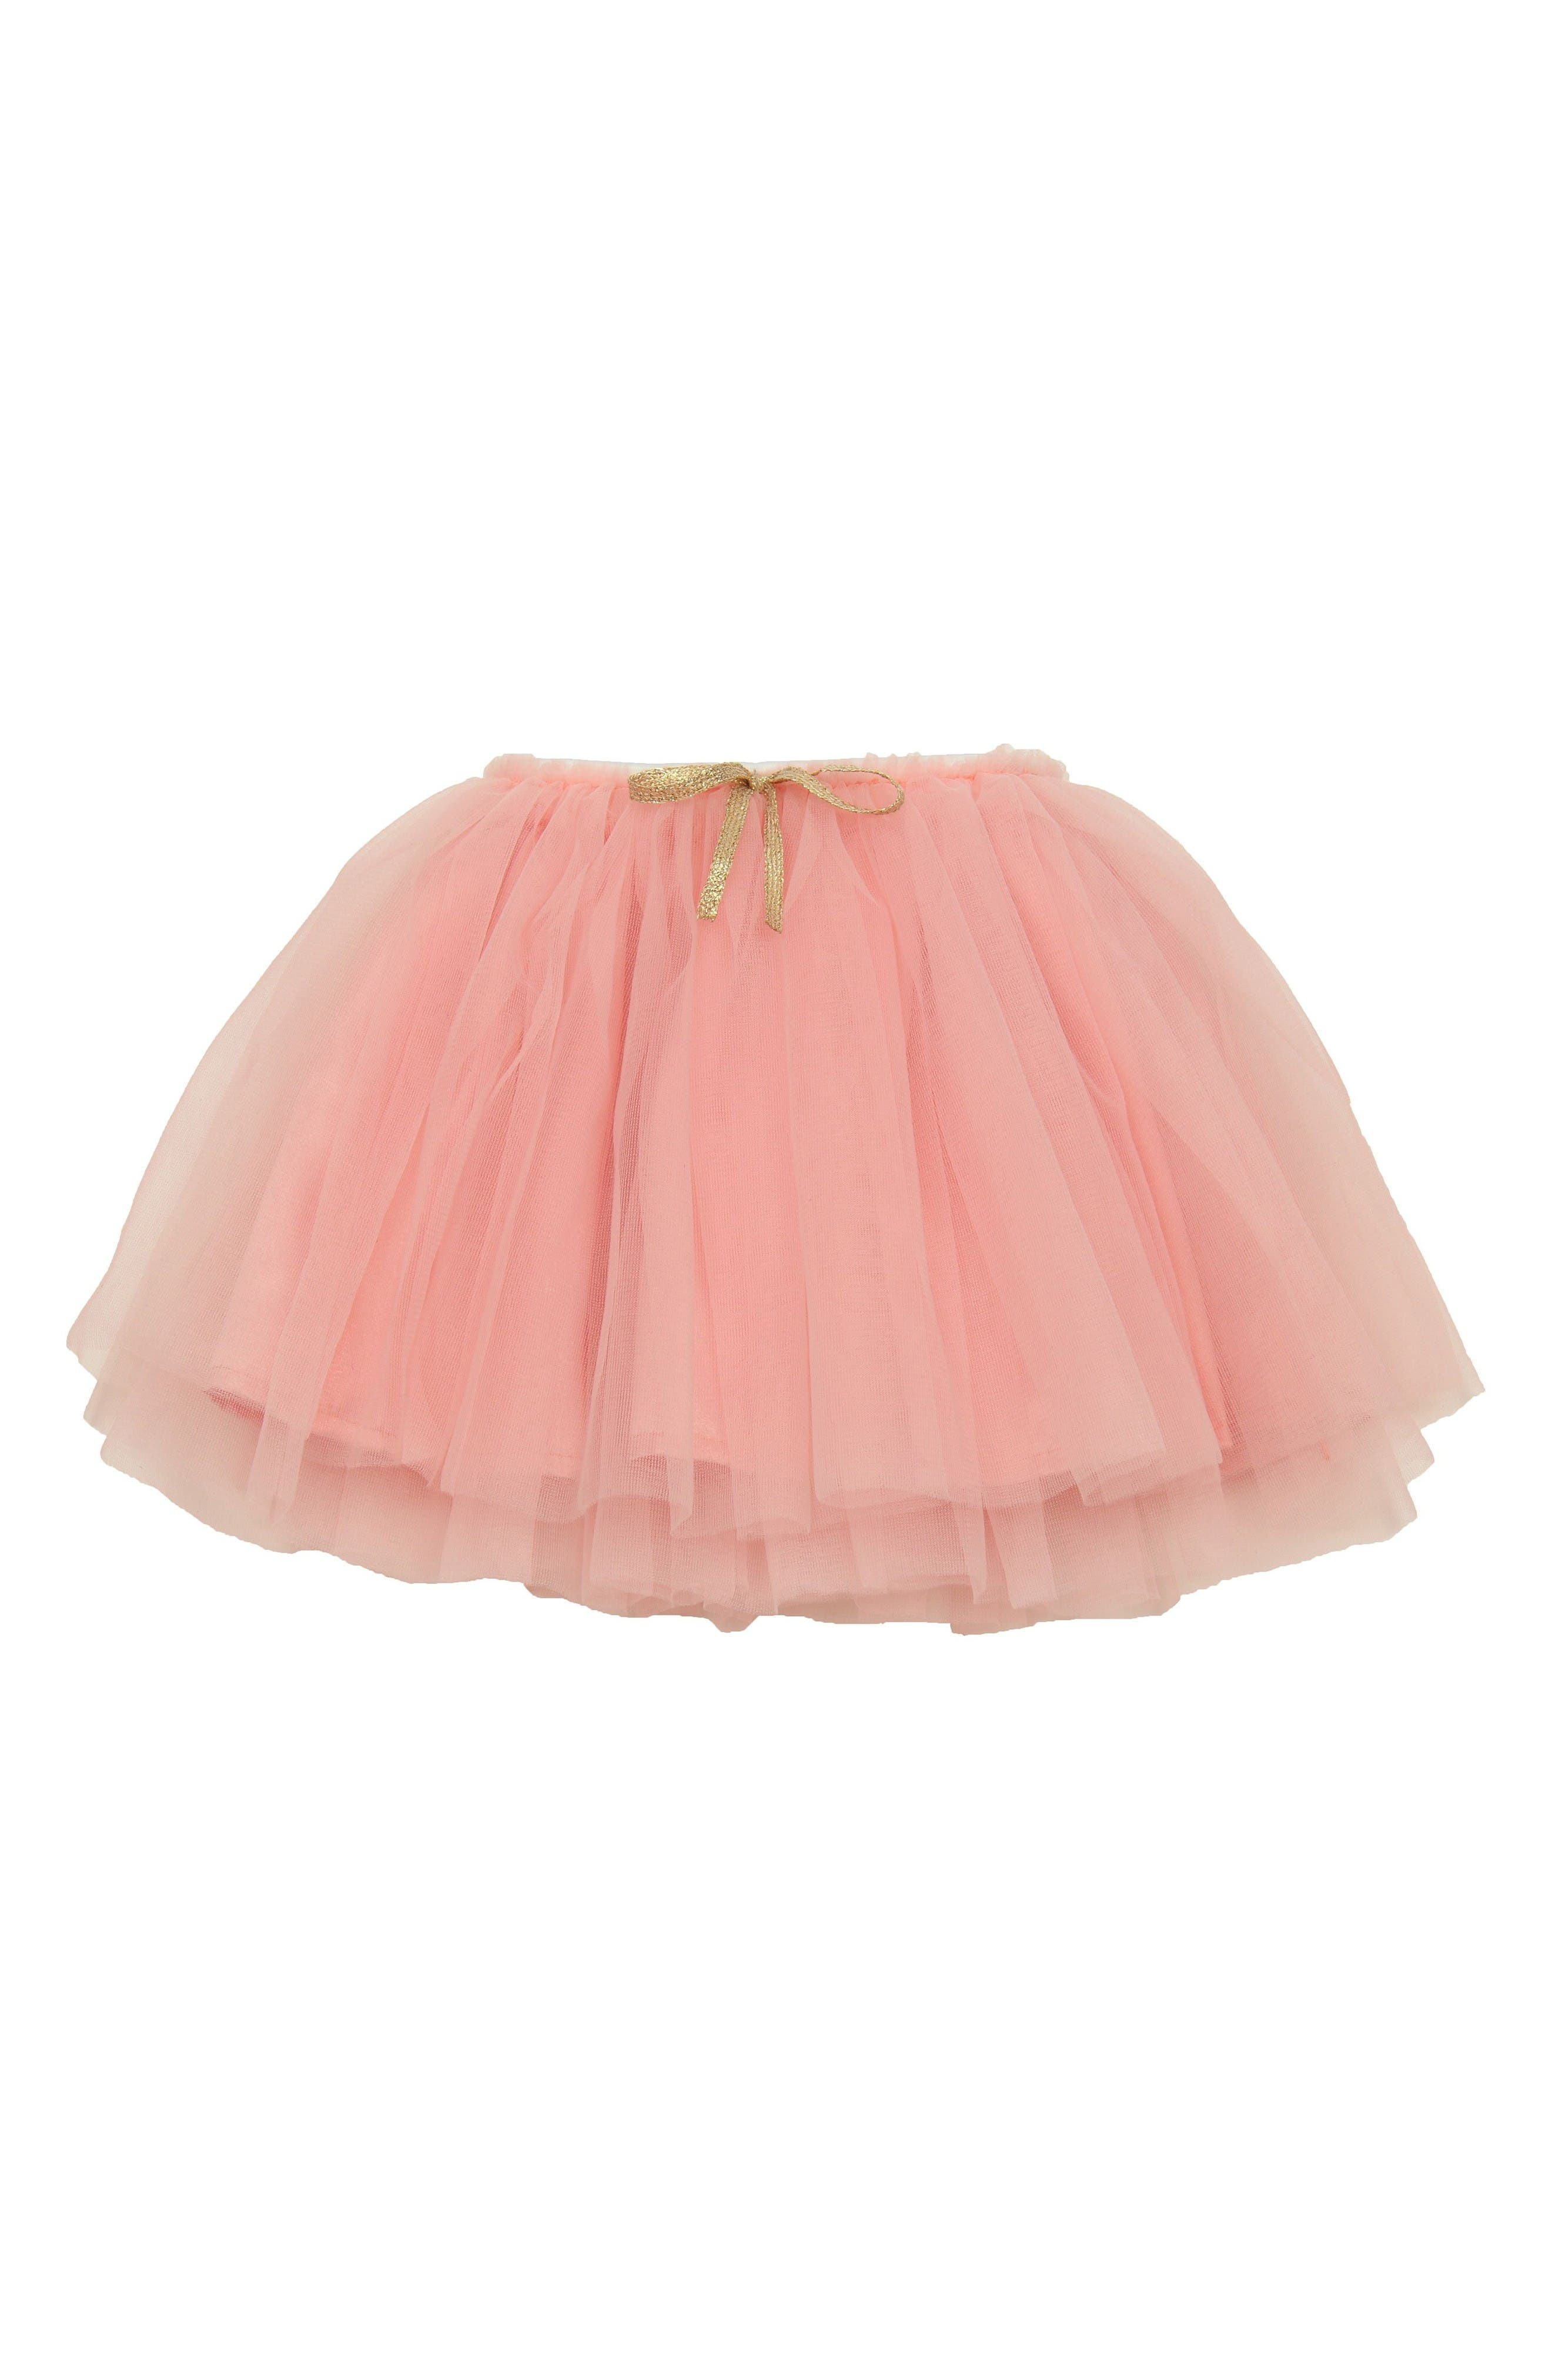 Tutu Skirt,                         Main,                         color, Peach